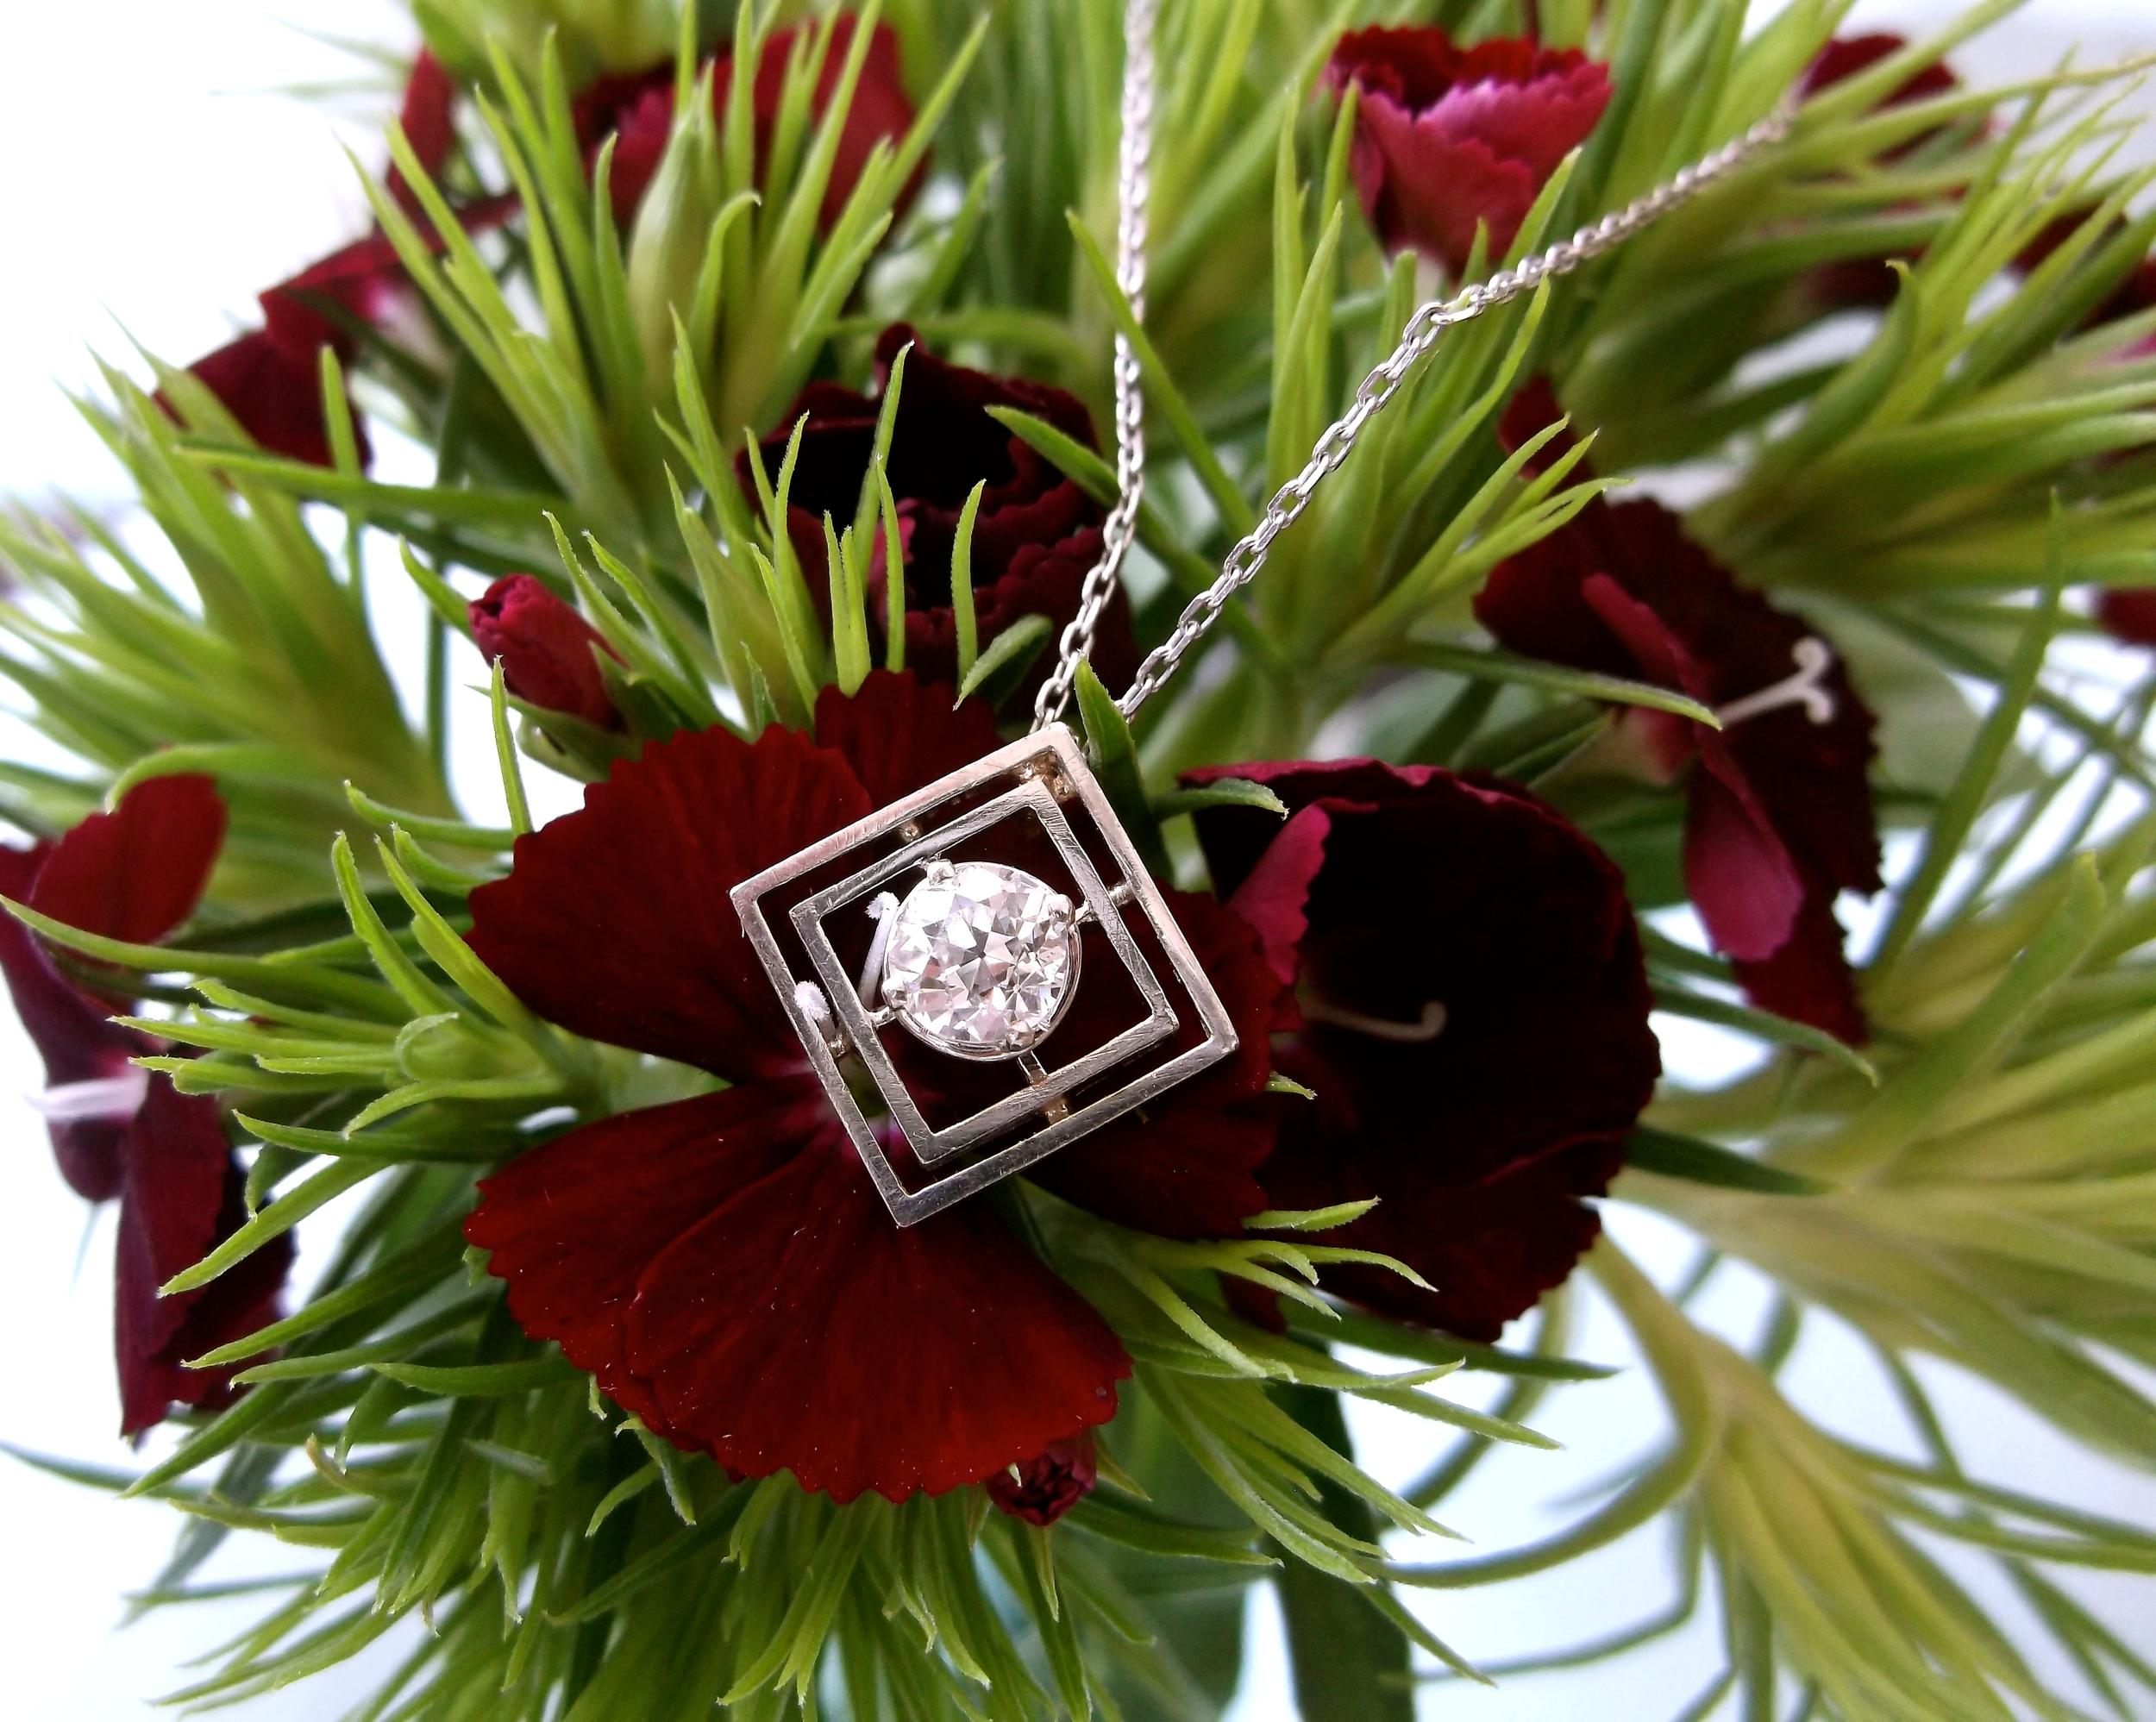 SOLD - Beautiful Art Deco 0.25 carat Old European cut diamond pendant set in white gold.